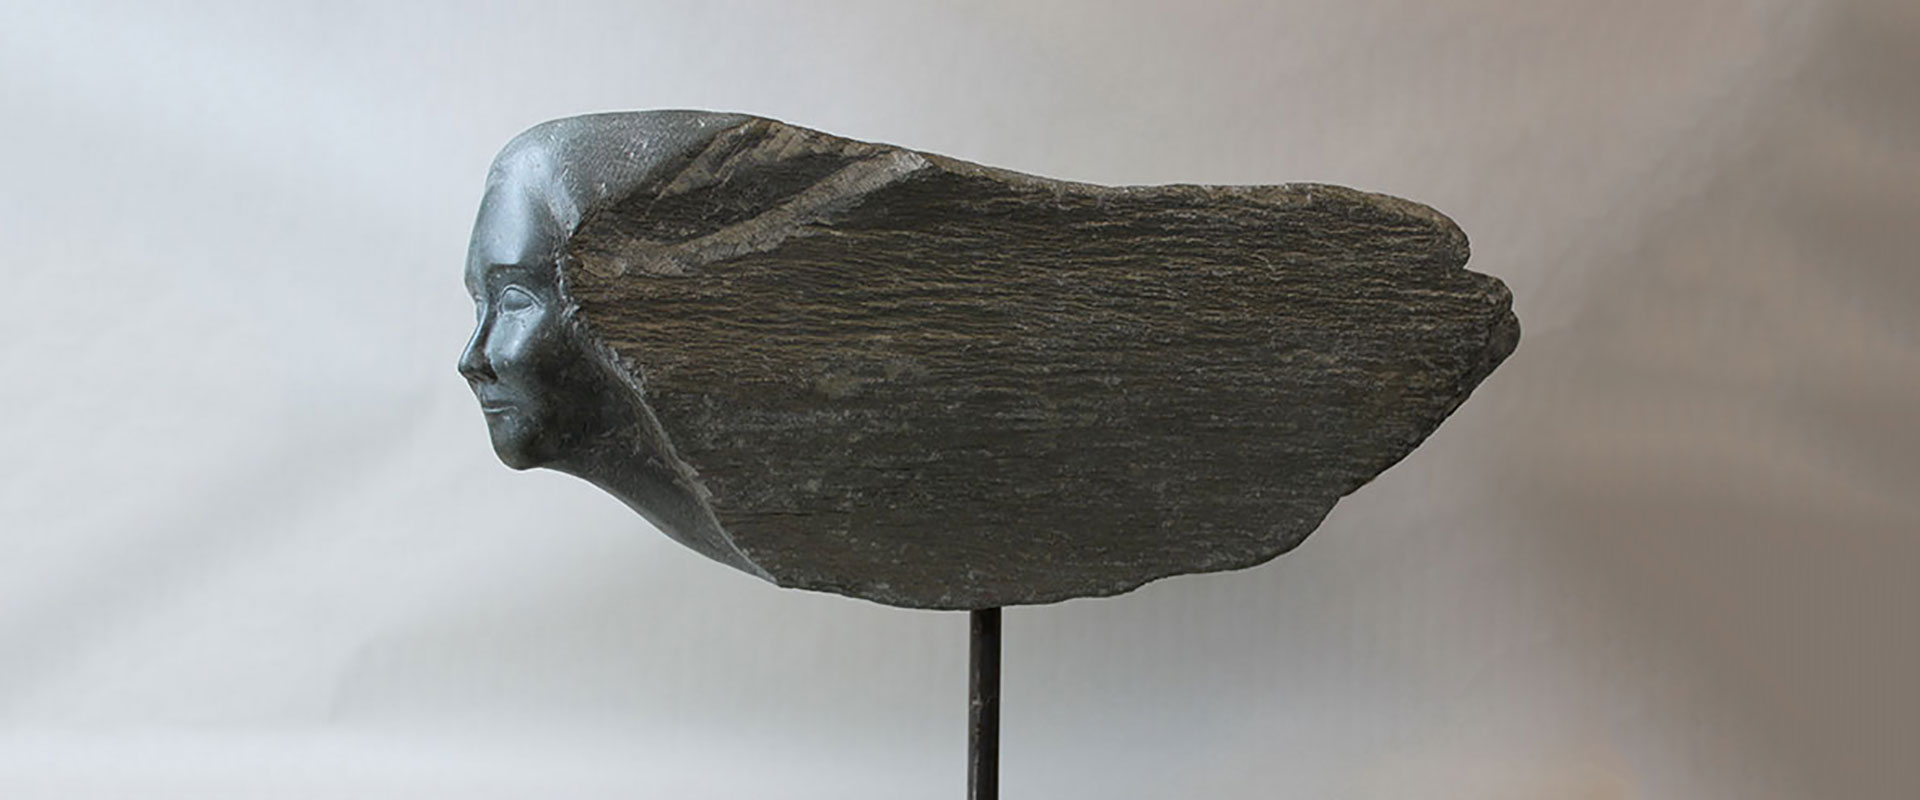 zephyr - sculpture by Jimmy Reynolds